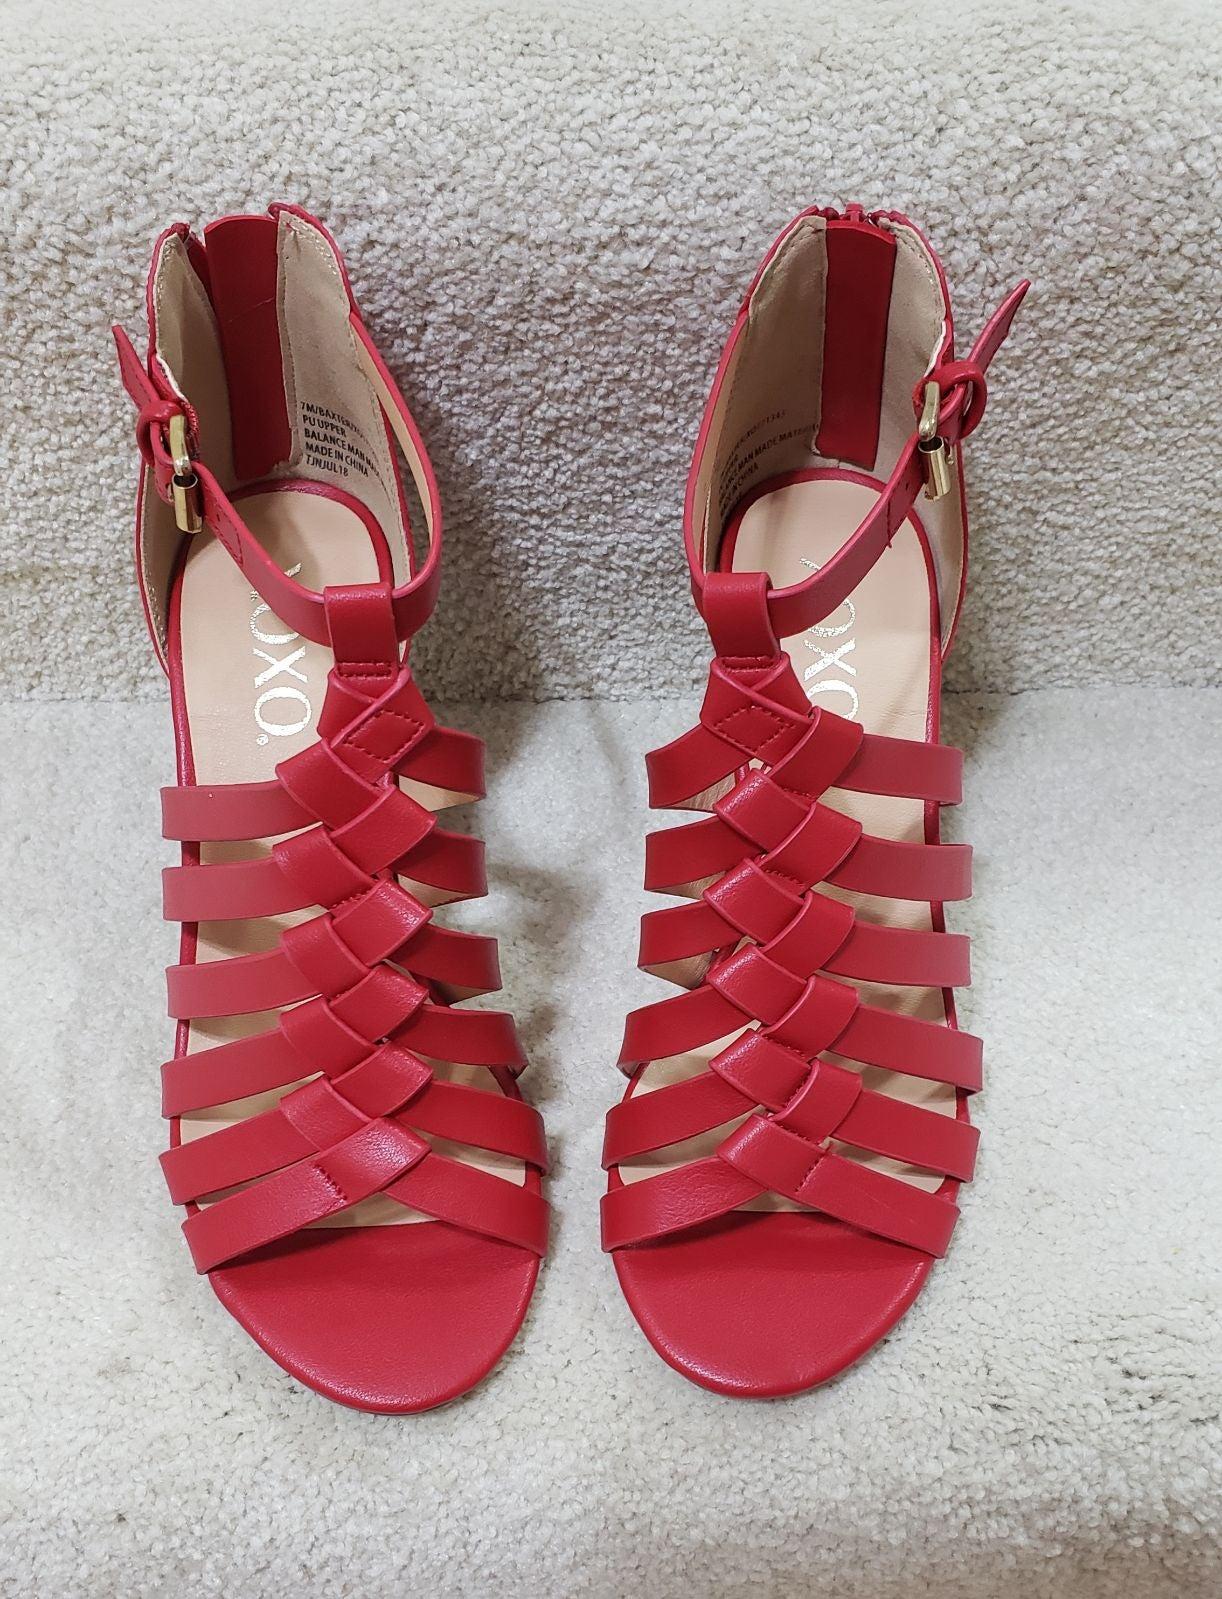 XOXO Baxter Wedge Sandals 7